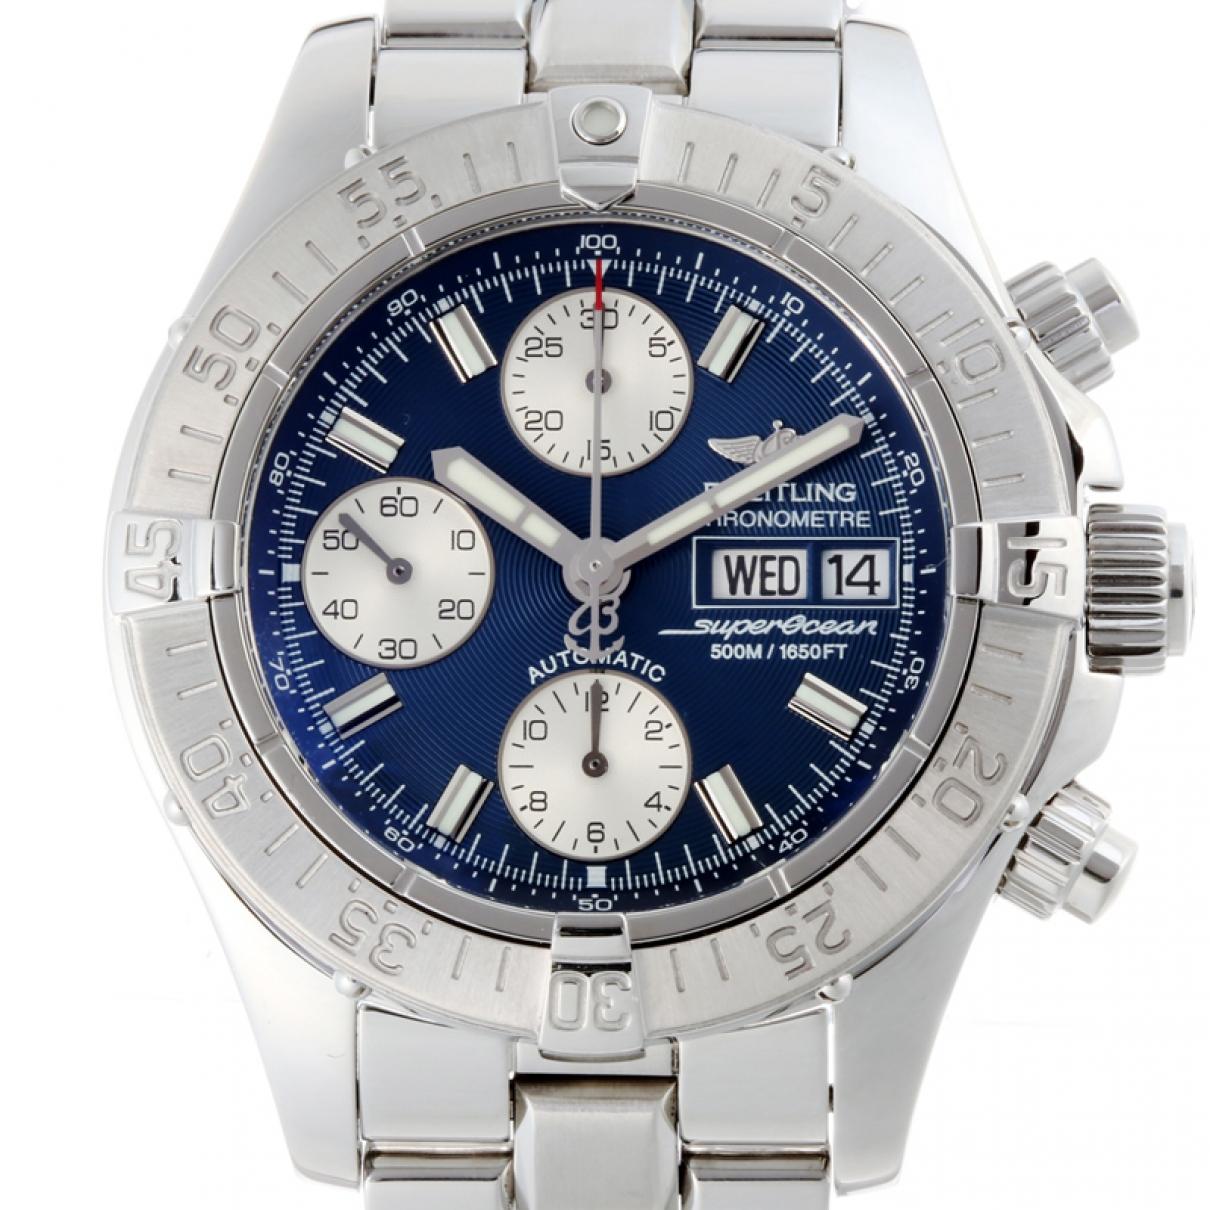 Relojes SuperOcean Breitling